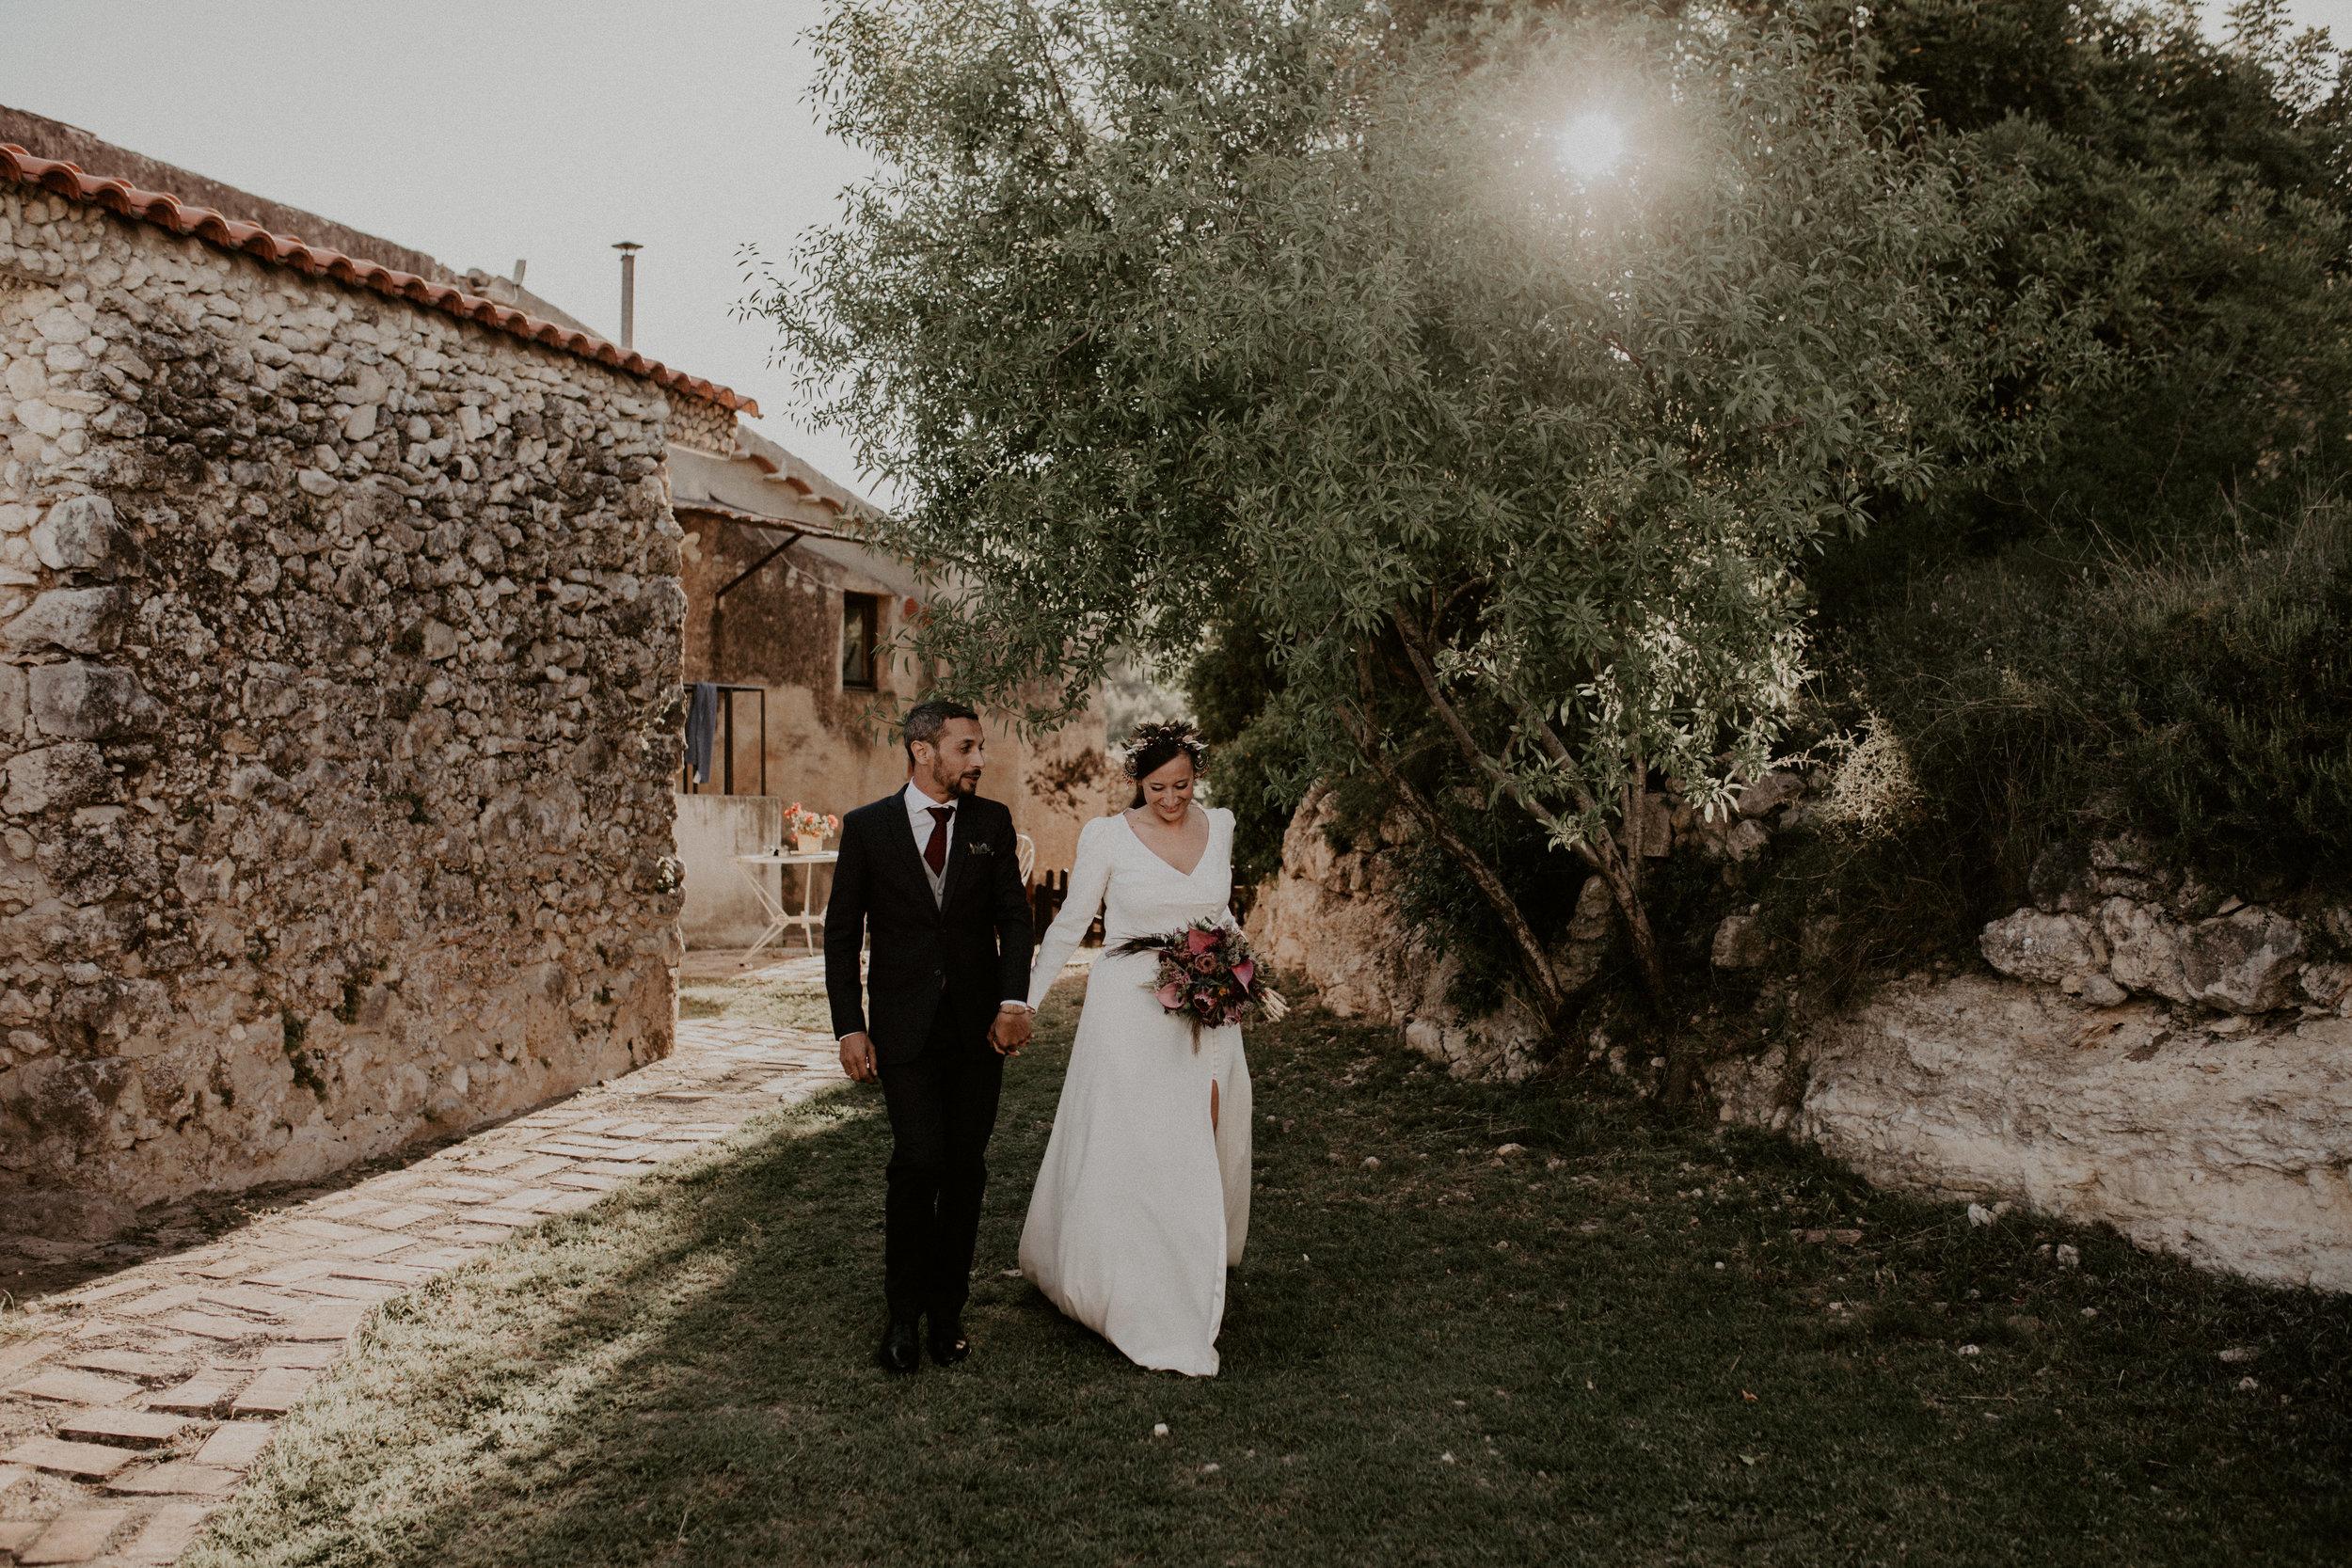 thenortherngirlphotography-fotografa-de-bodas-barcelona_destinartion-wedding-photographer_wedding-photographer_moroccan-wedding_HADNANANTIGONA-669.jpg